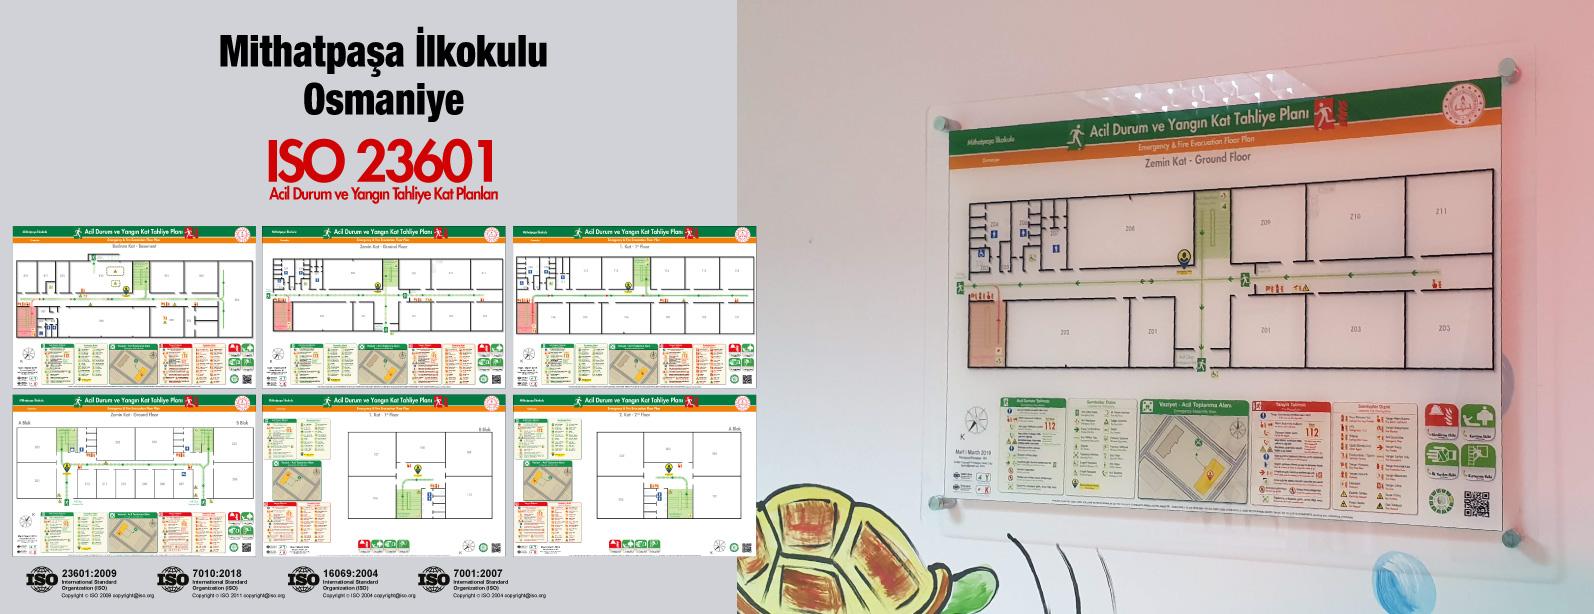 osmaniye-mithatpasa-ilkokulu ISO23601 Acil Durum ve Yangin Tahliye Kat Plani Pleksi